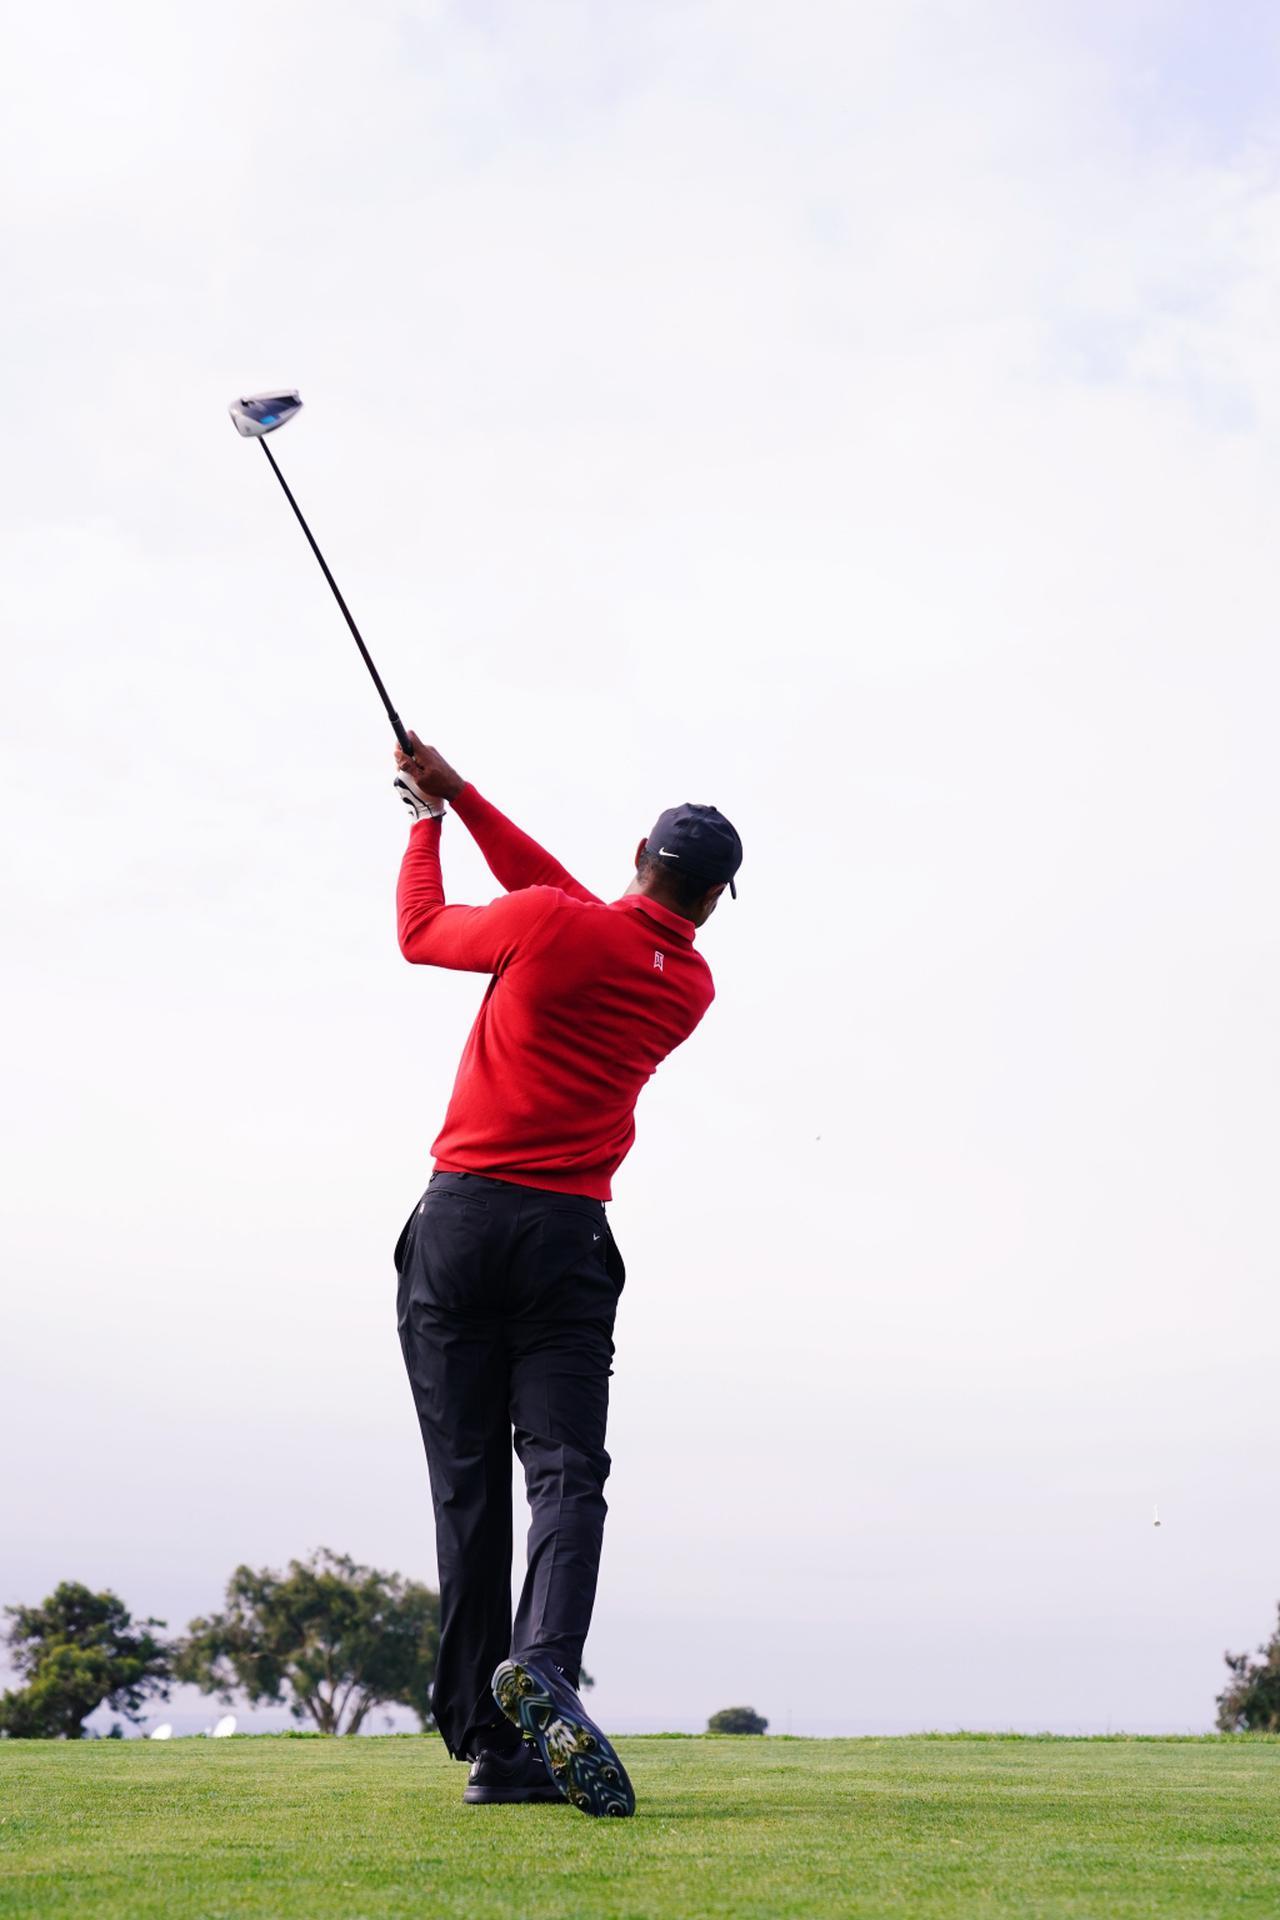 Images : 10番目の画像 - タイガー・ウッズのドライバー連続写真 - みんなのゴルフダイジェスト